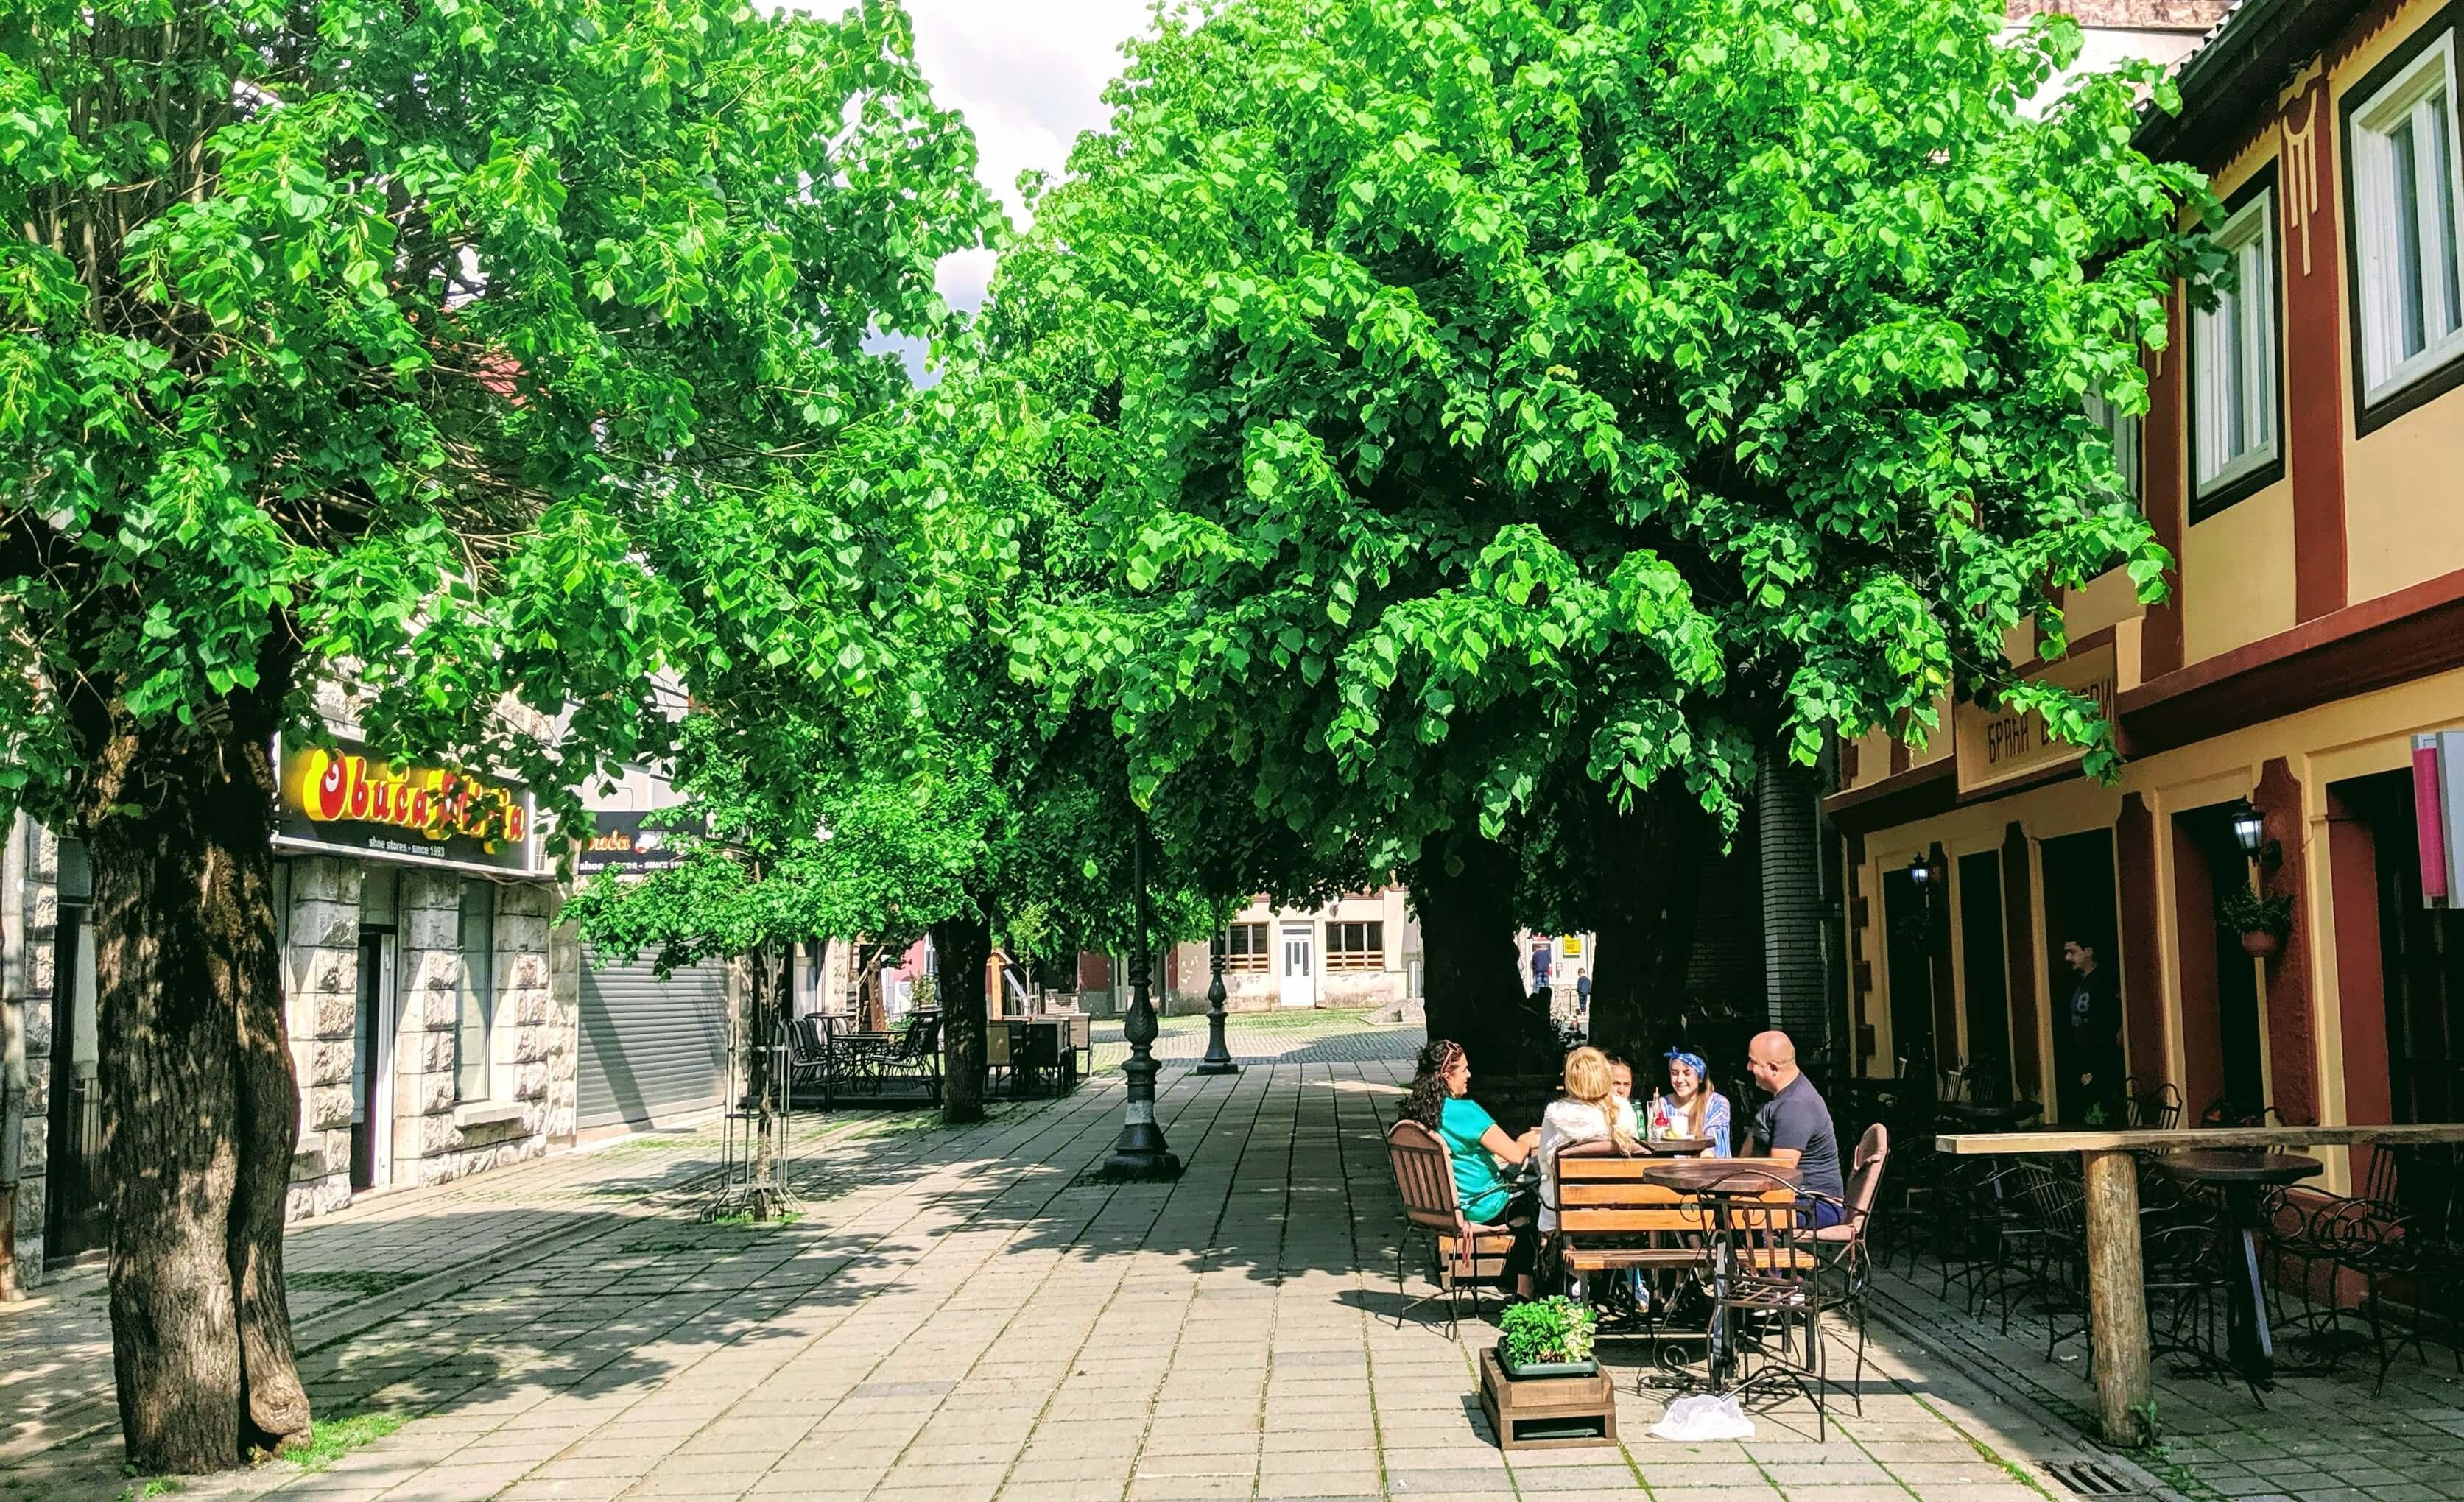 Cafes along Kolasin's small old town.